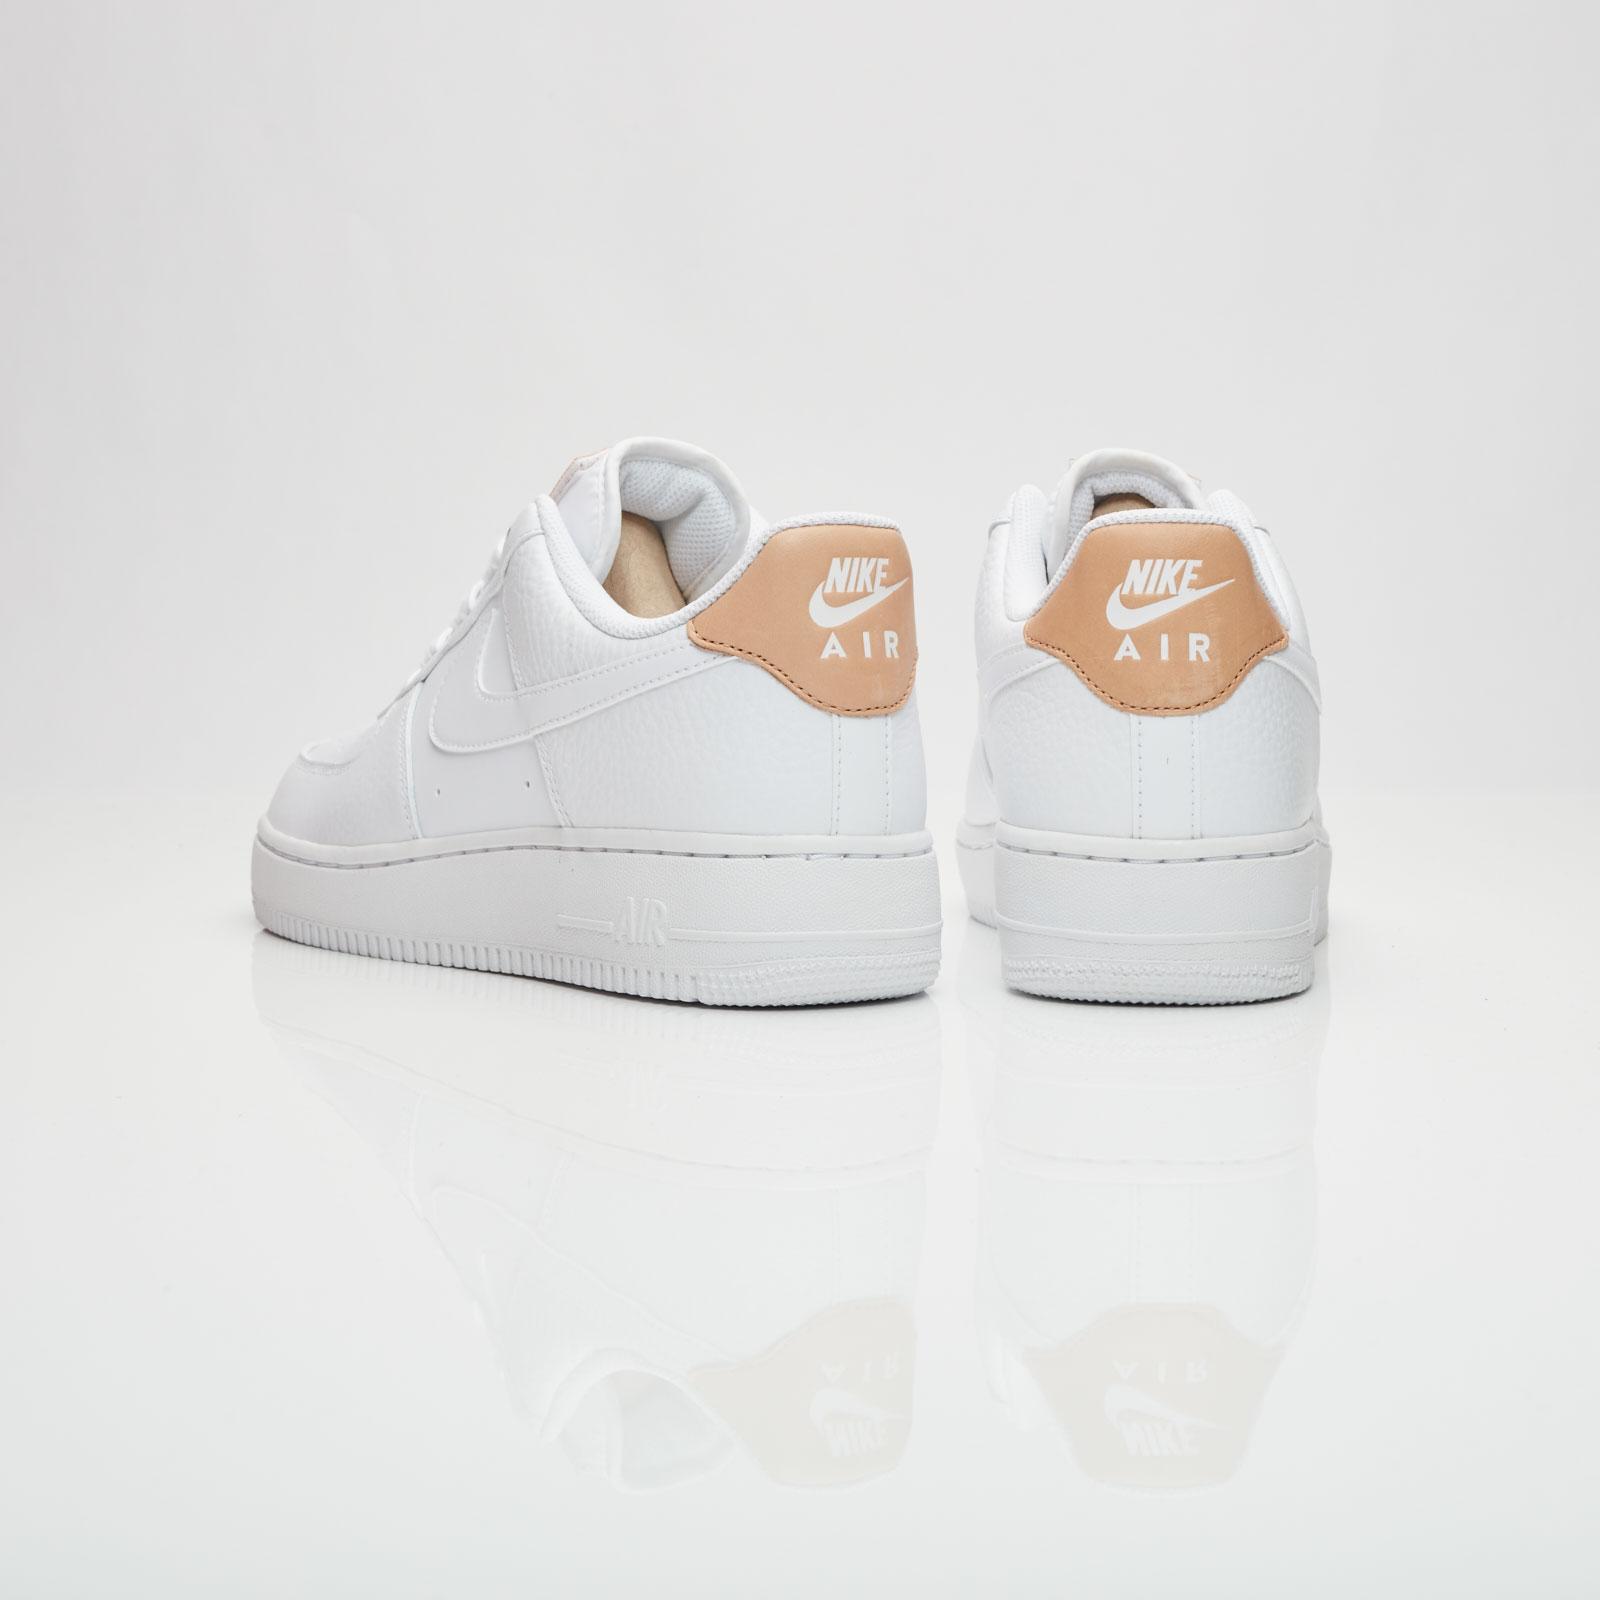 e0f28e3e5e4 Nike Air Force 1 07 Lv8 - 718152-108 - Sneakersnstuff